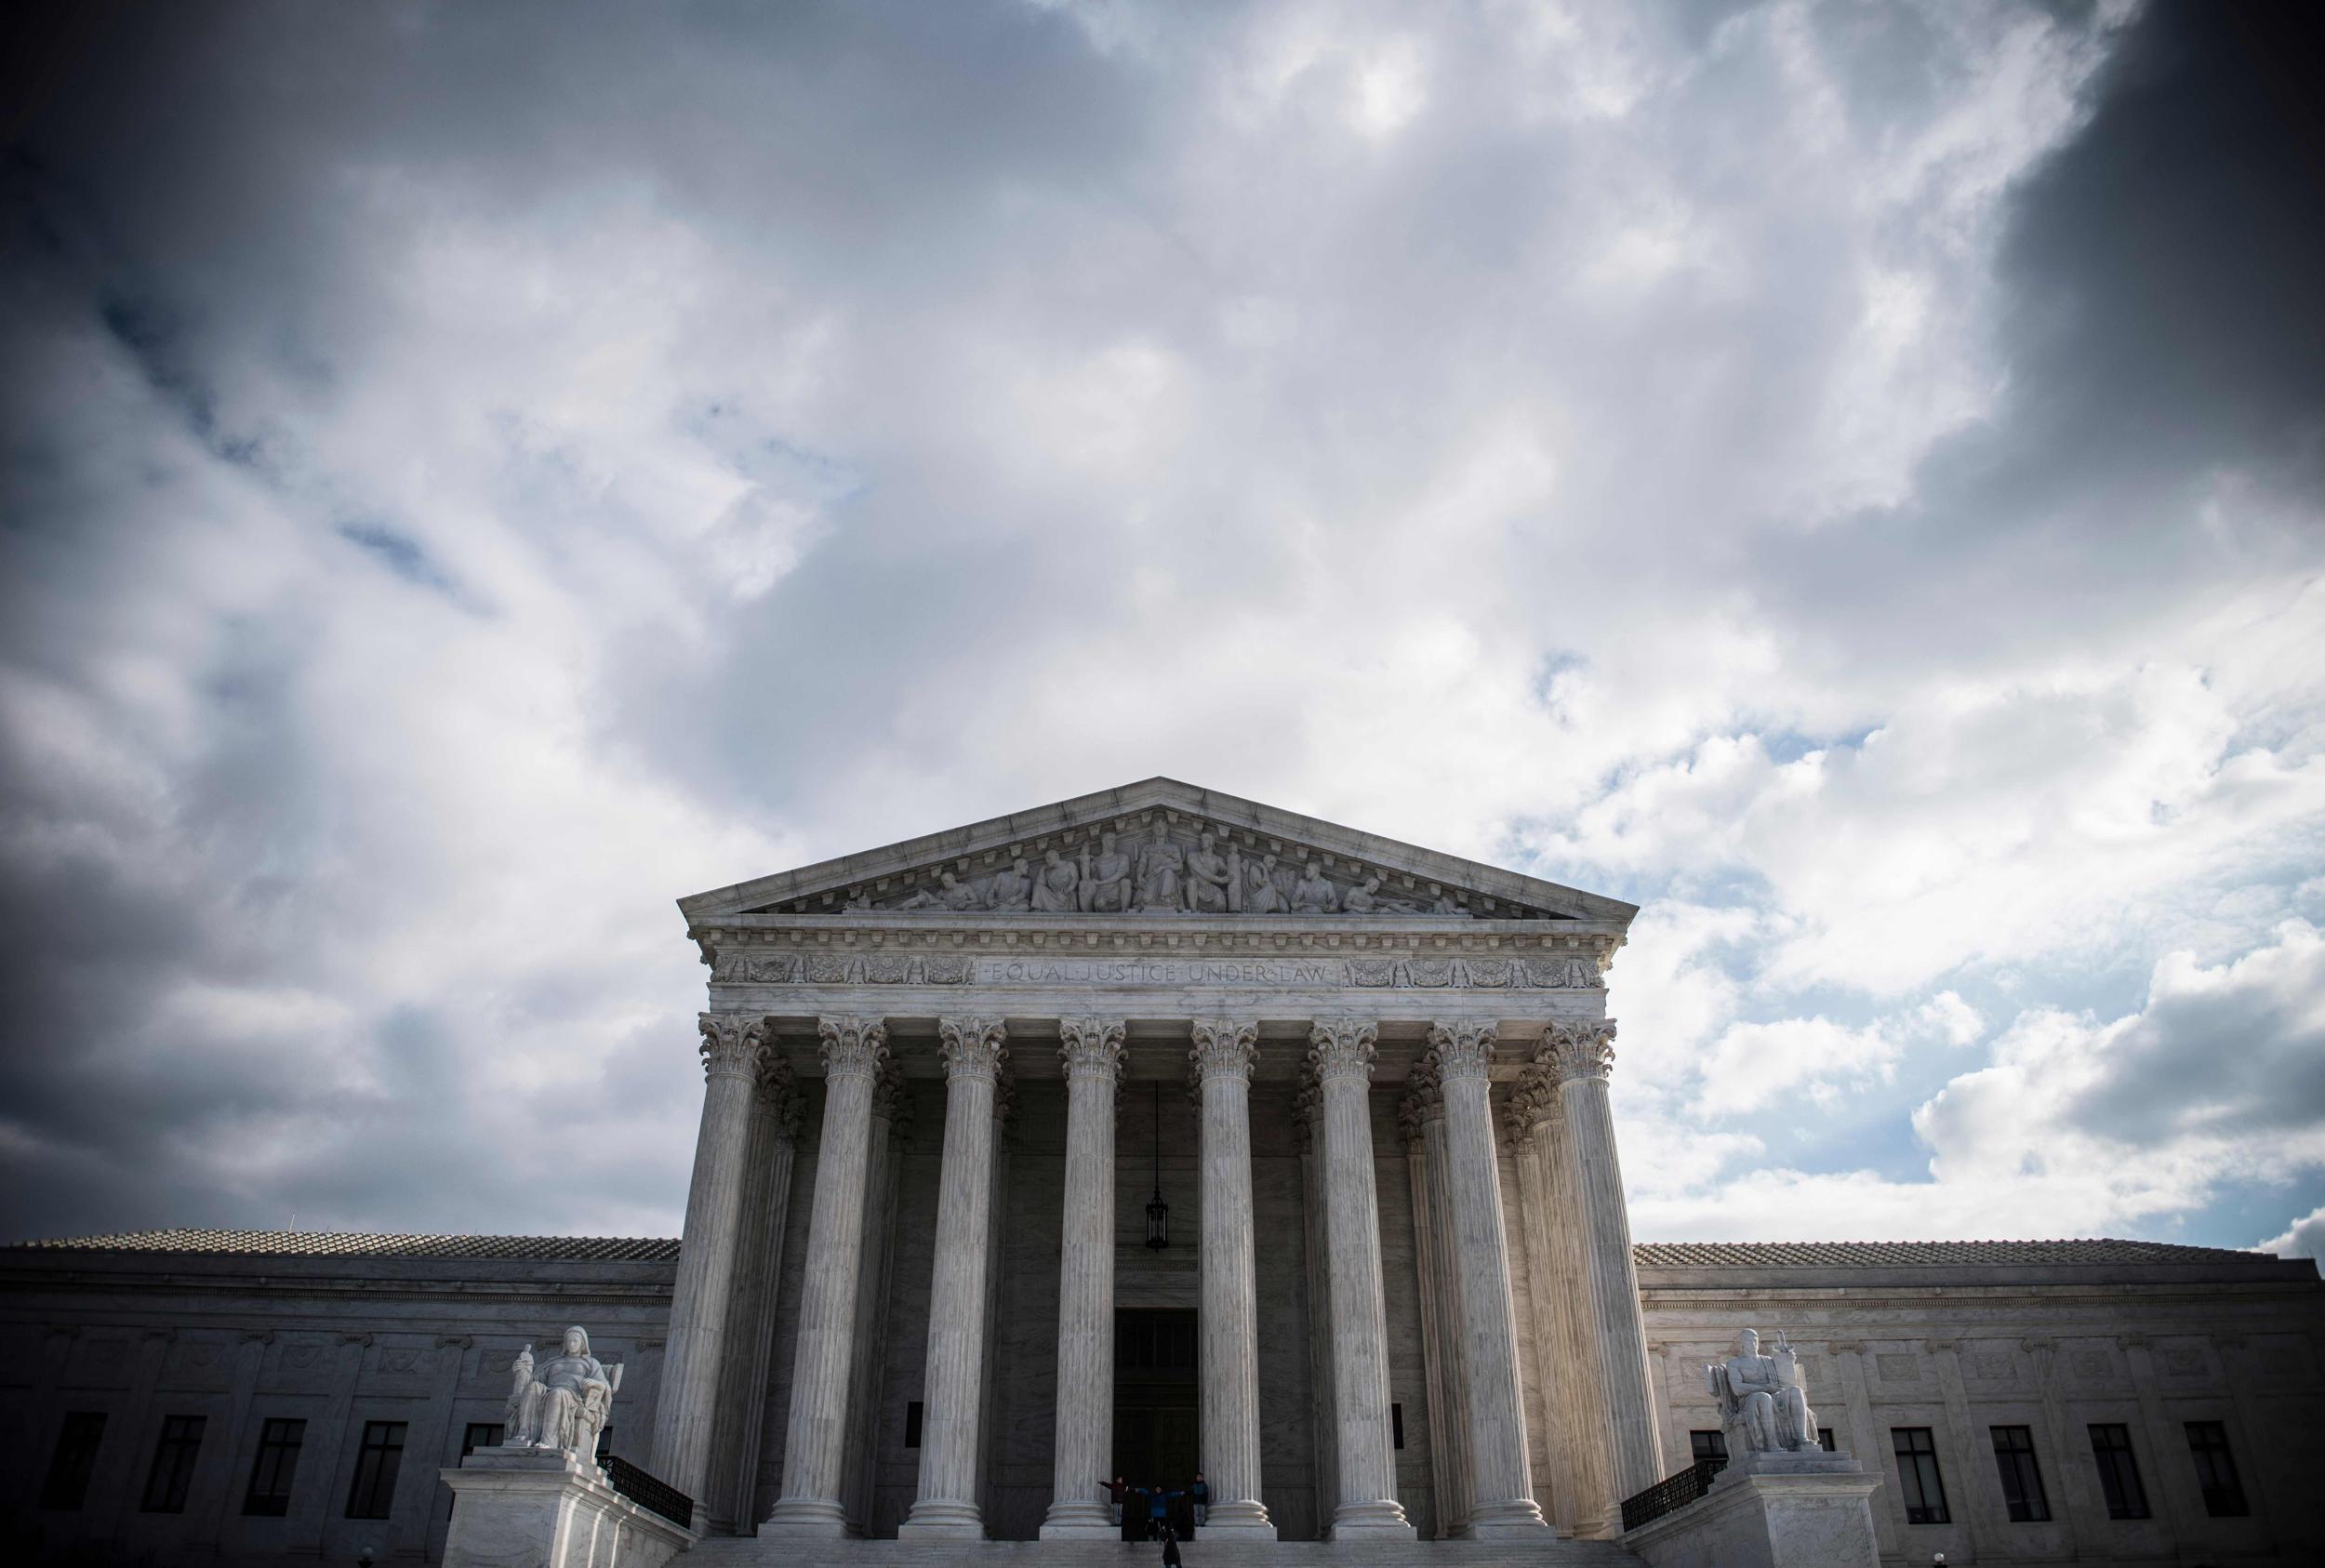 Supreme-Court-to-hear-gerrymandering-cases-against-Democrats,-Republicans